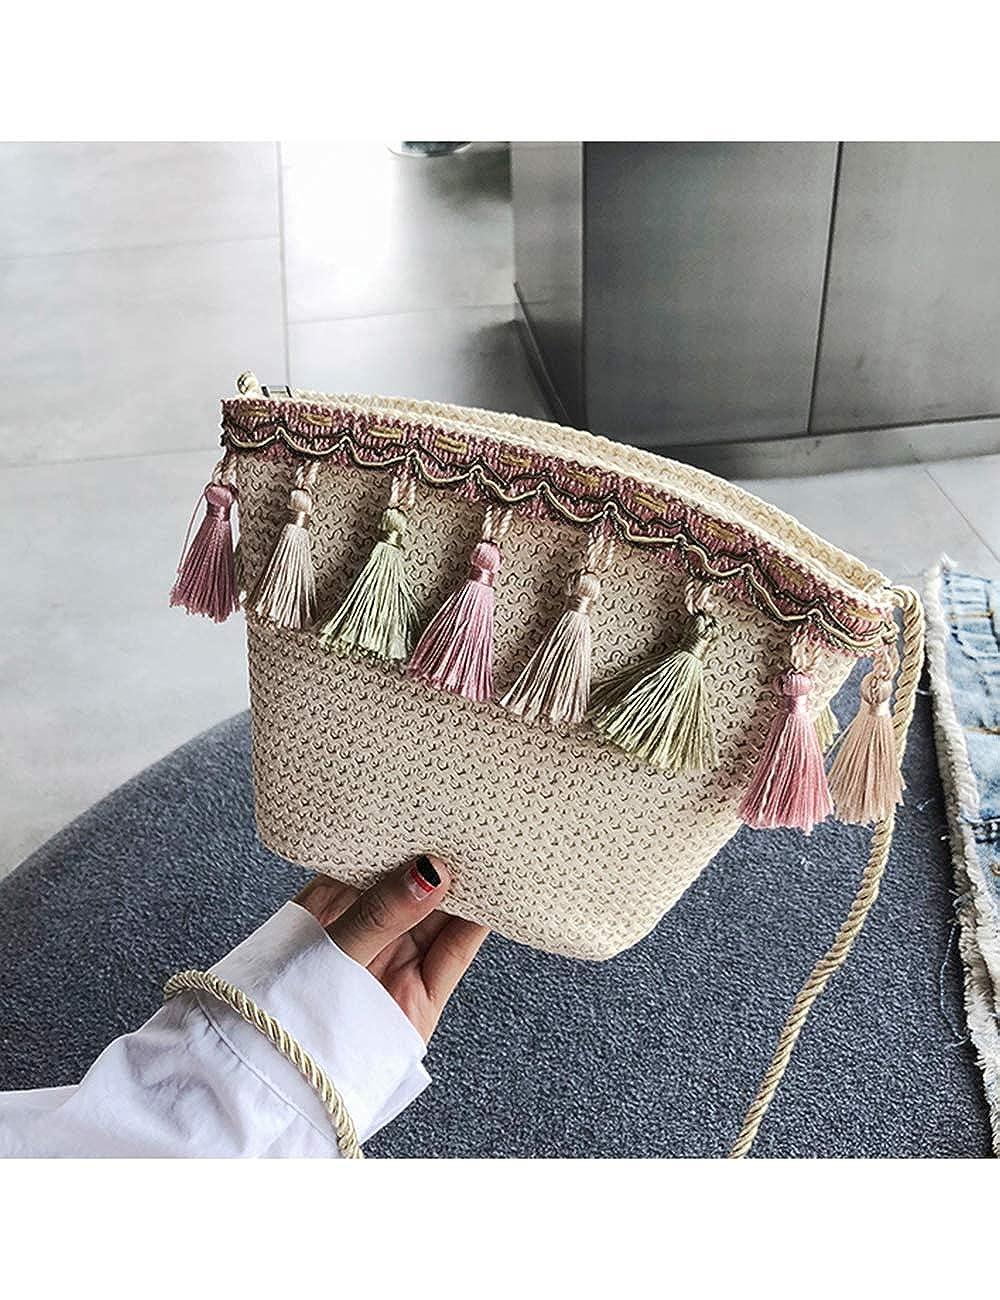 Hobo Straw Shoulder Bag Small Tassel Crossbody Bag Summer Lightweight Handbag Zipper Bucket Tote Bag besbomig